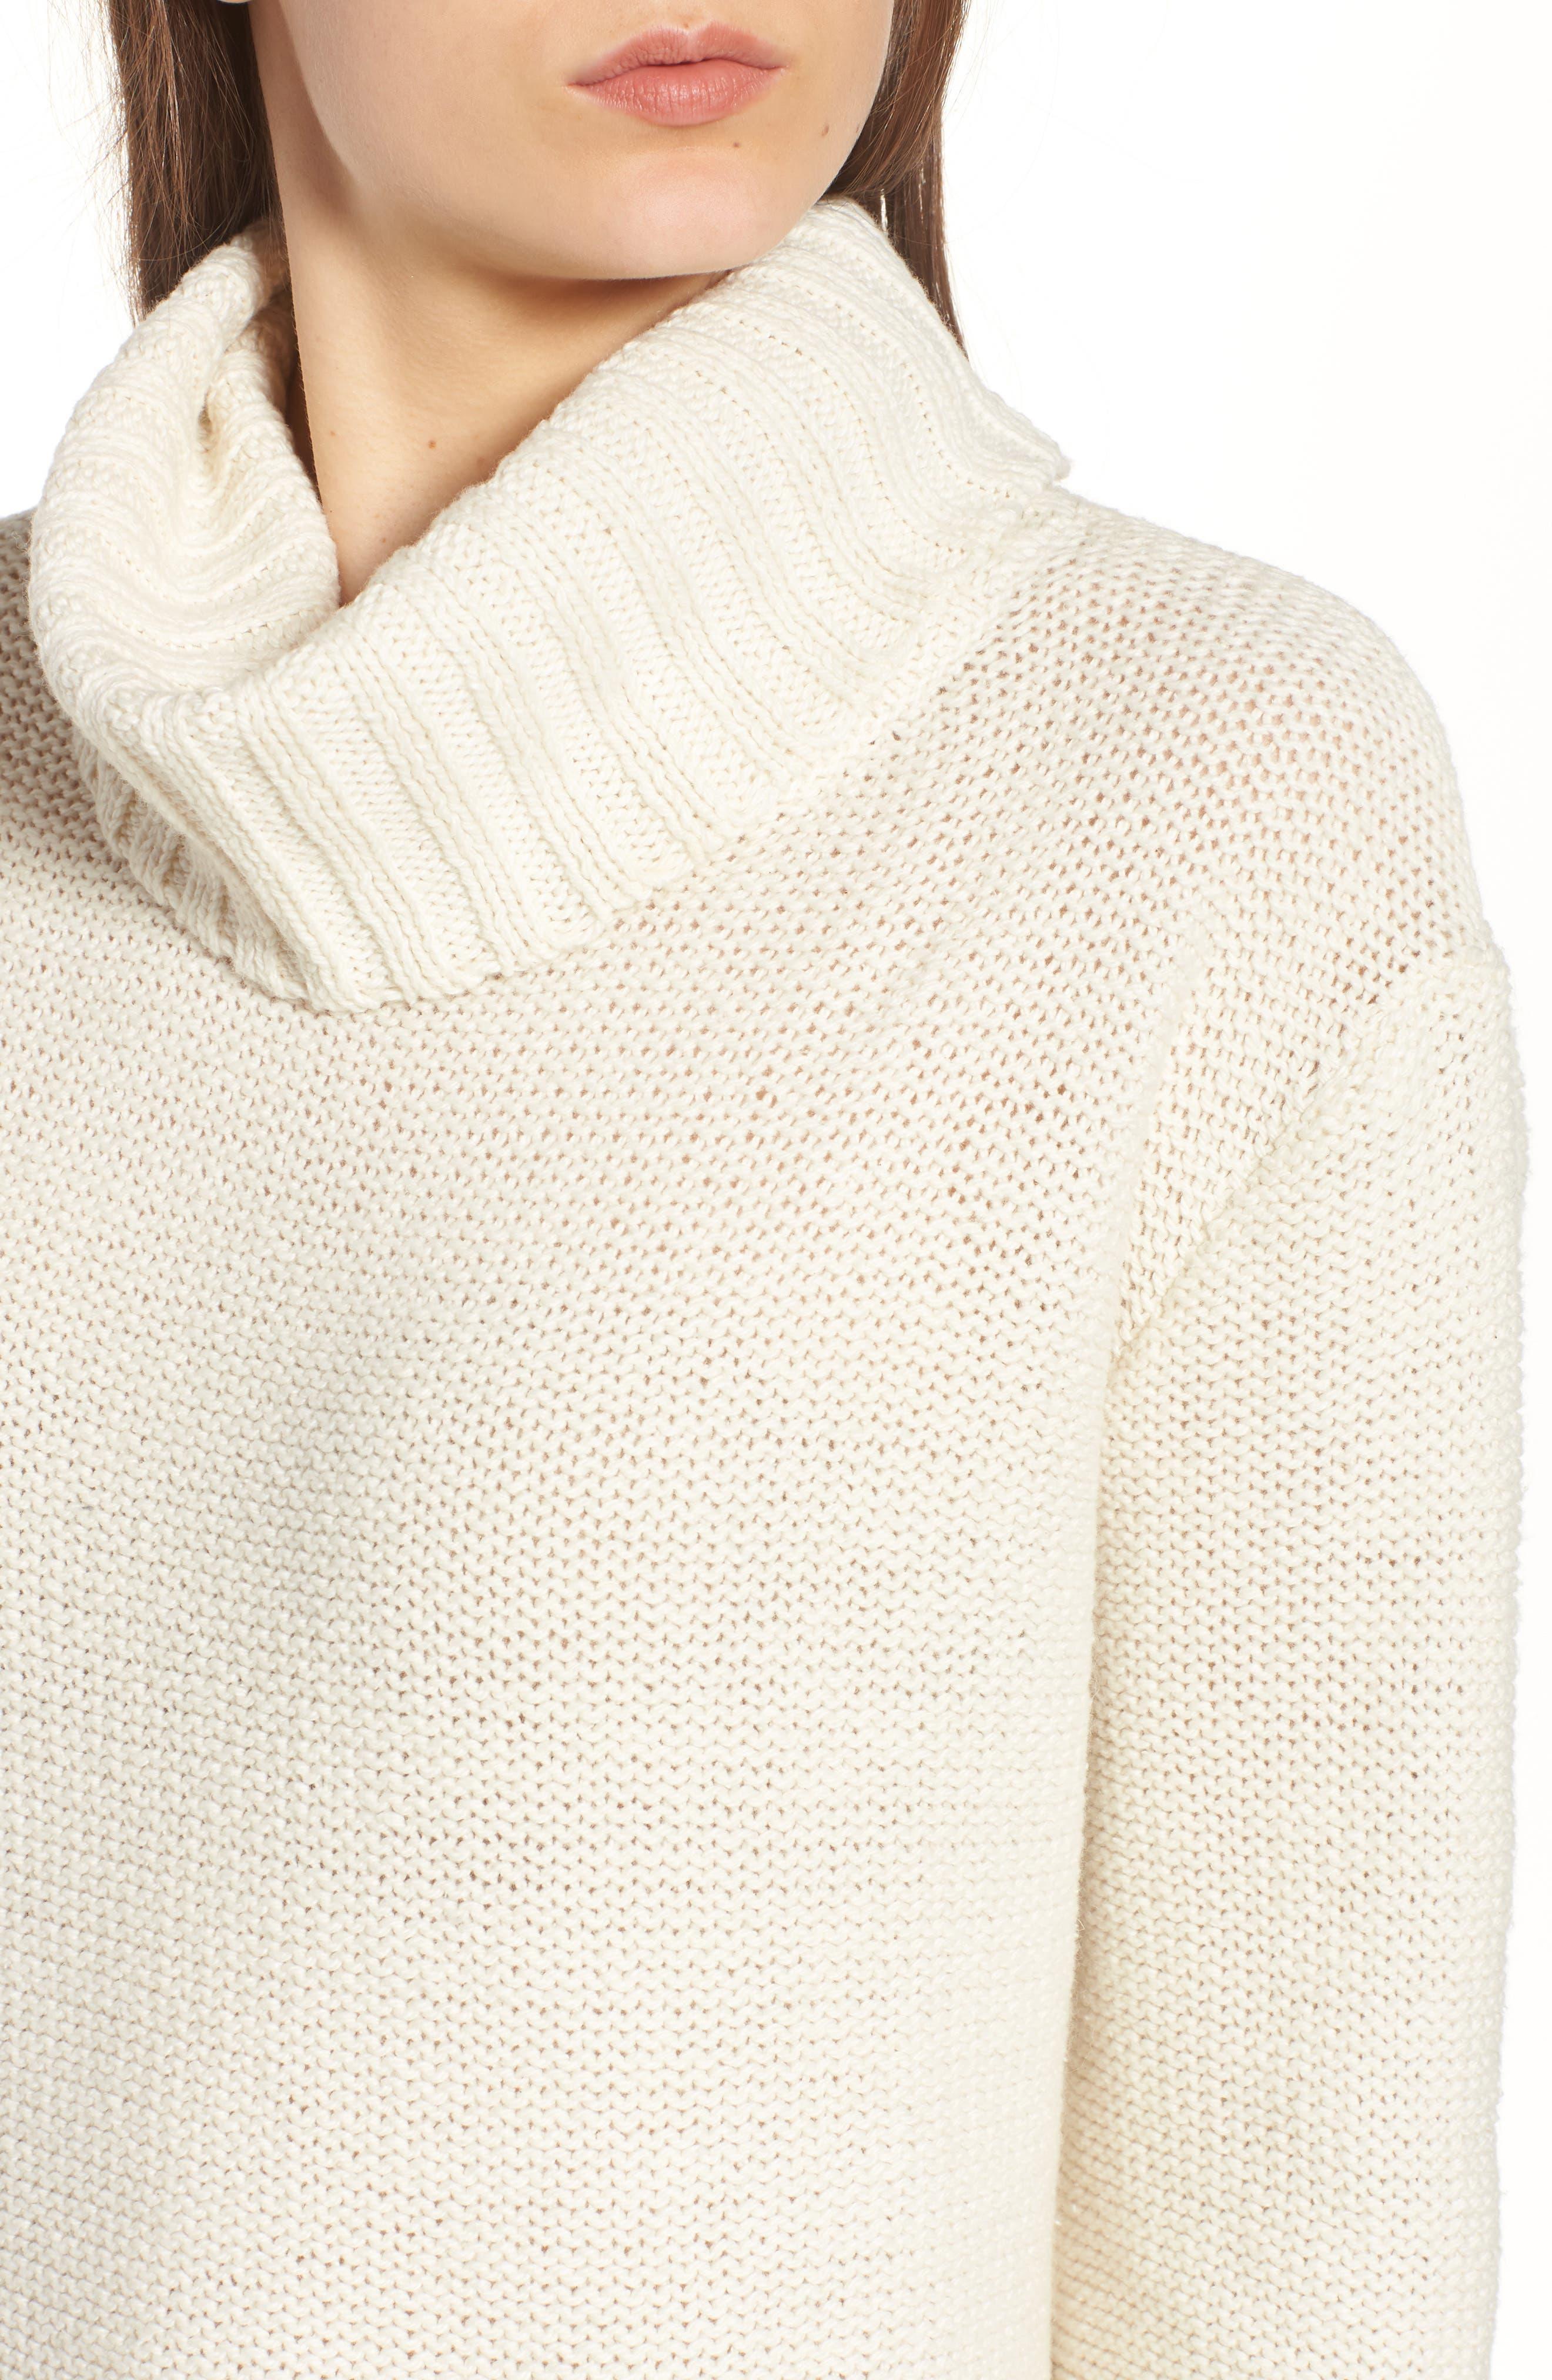 Flecked Turtleneck Sweater,                             Alternate thumbnail 4, color,                             Antique Cream